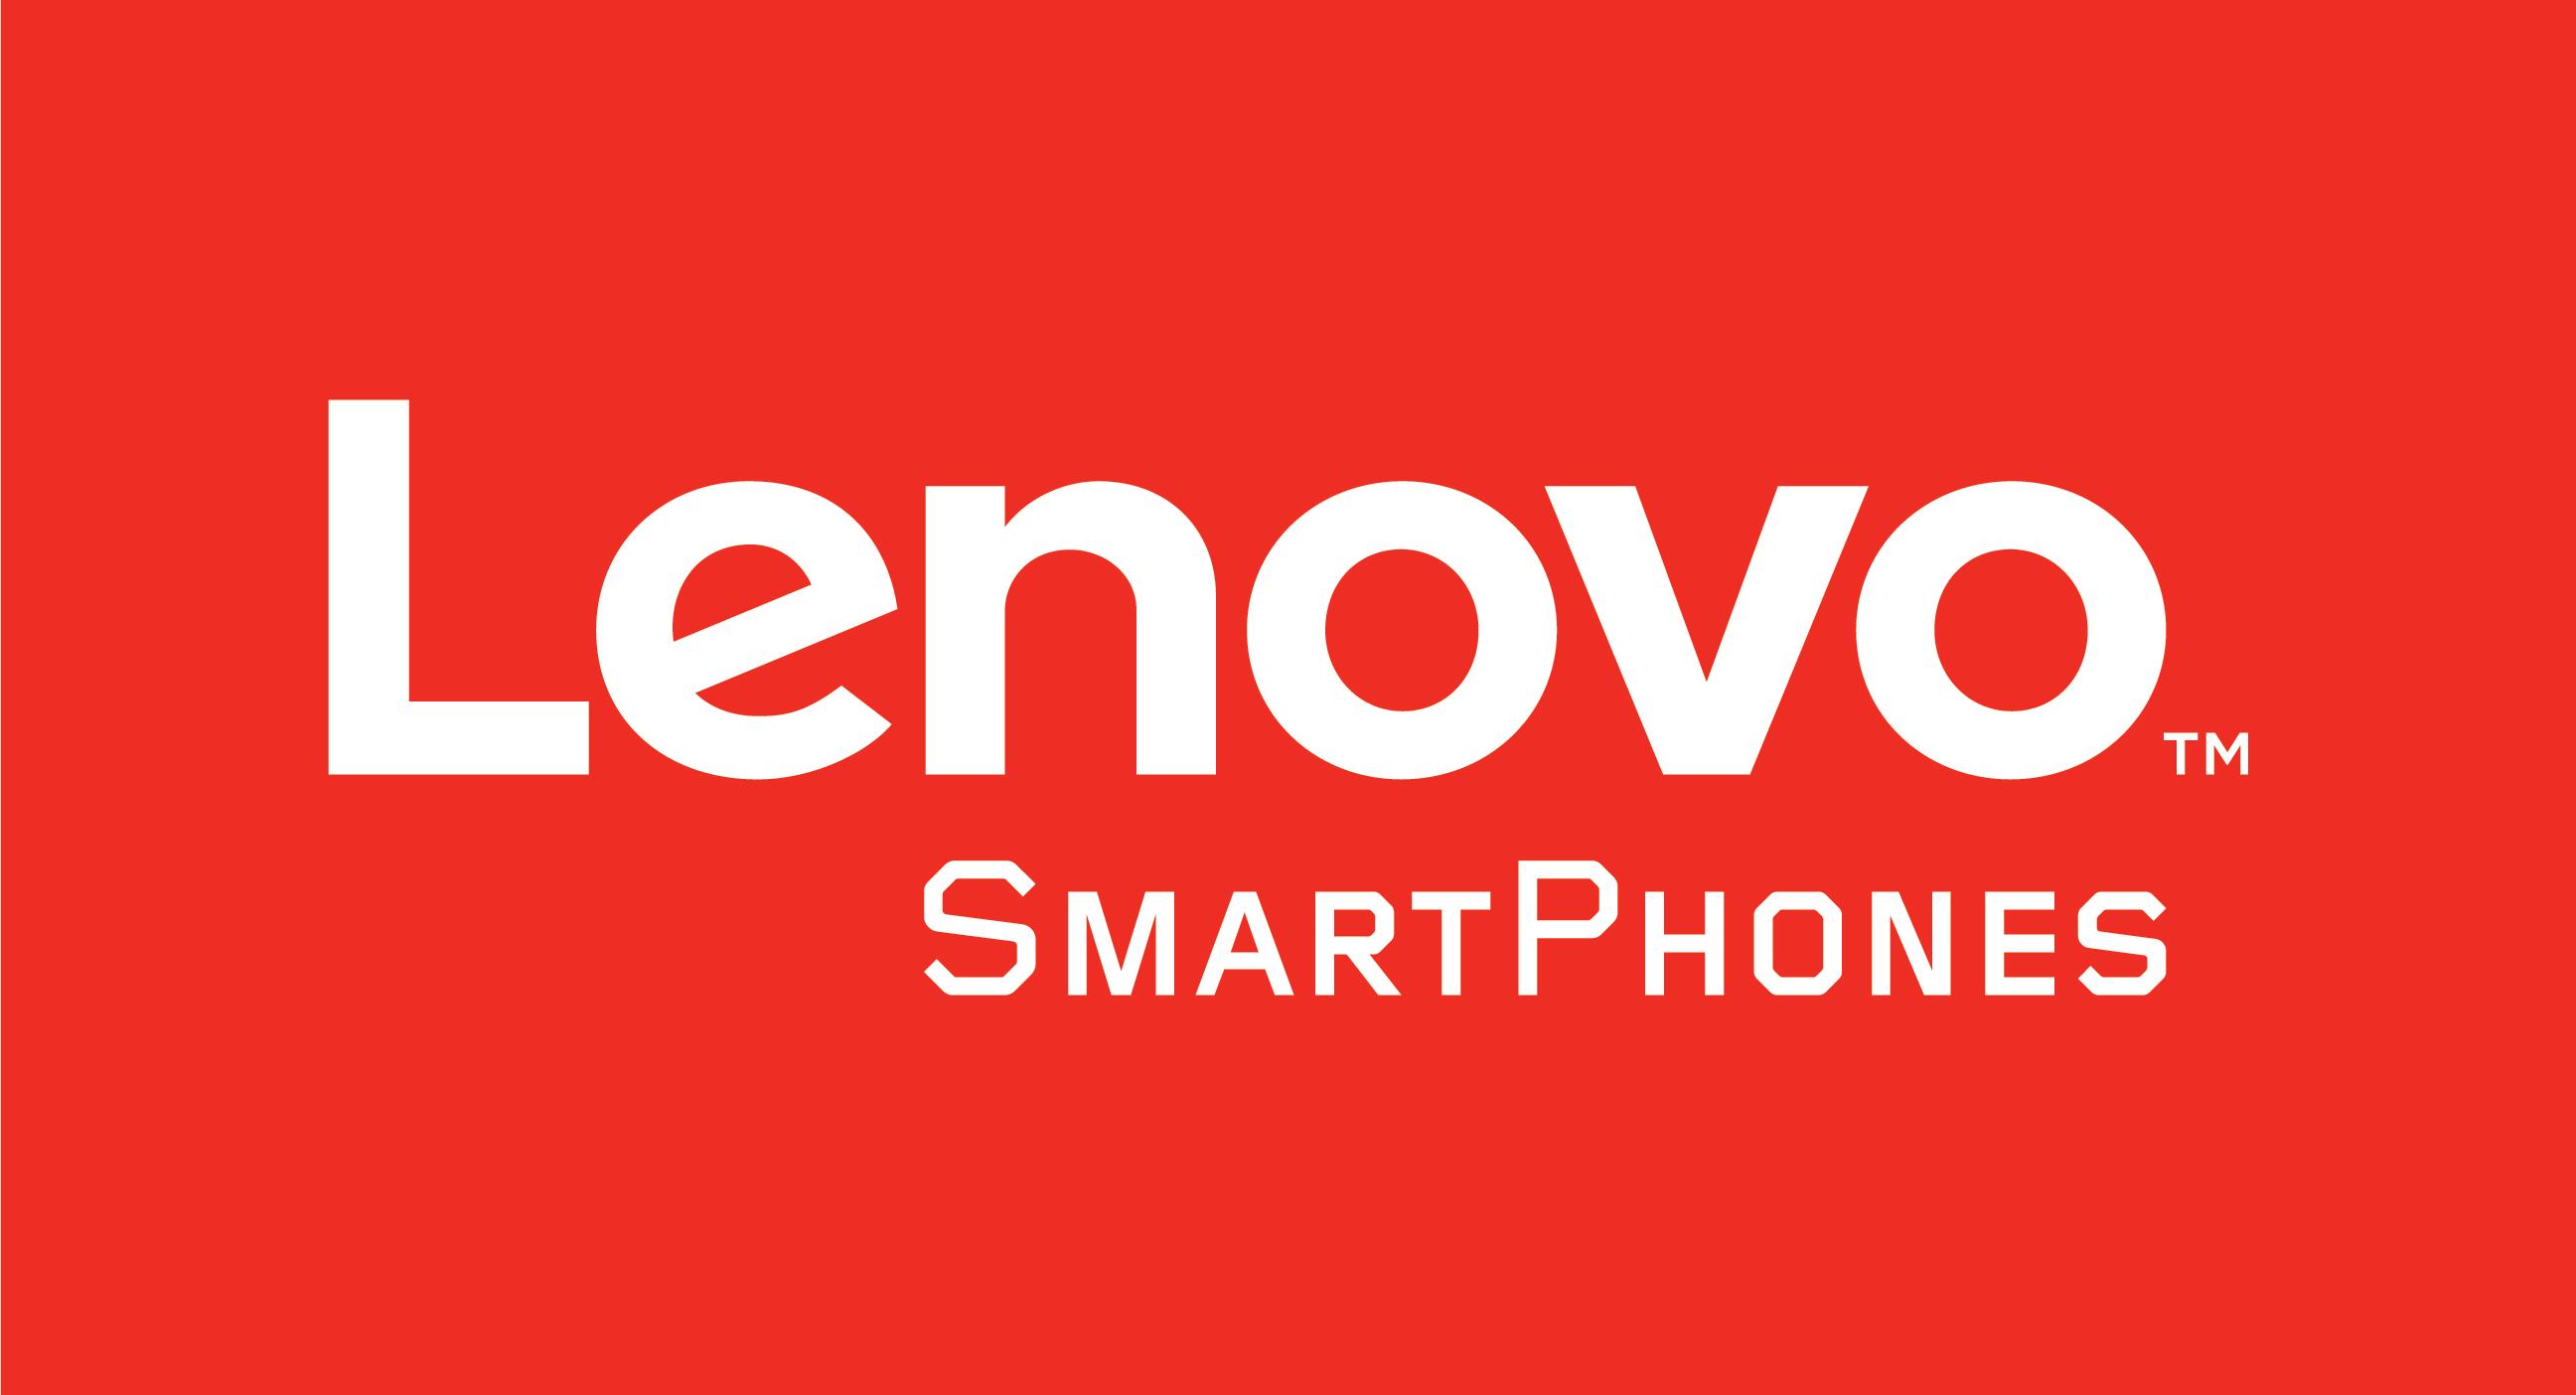 लेनोभो स्मार्टफोनको नयाँ मोडल आउँदै, स्मार्टफोन खरिदमा स्योर सट उपहार